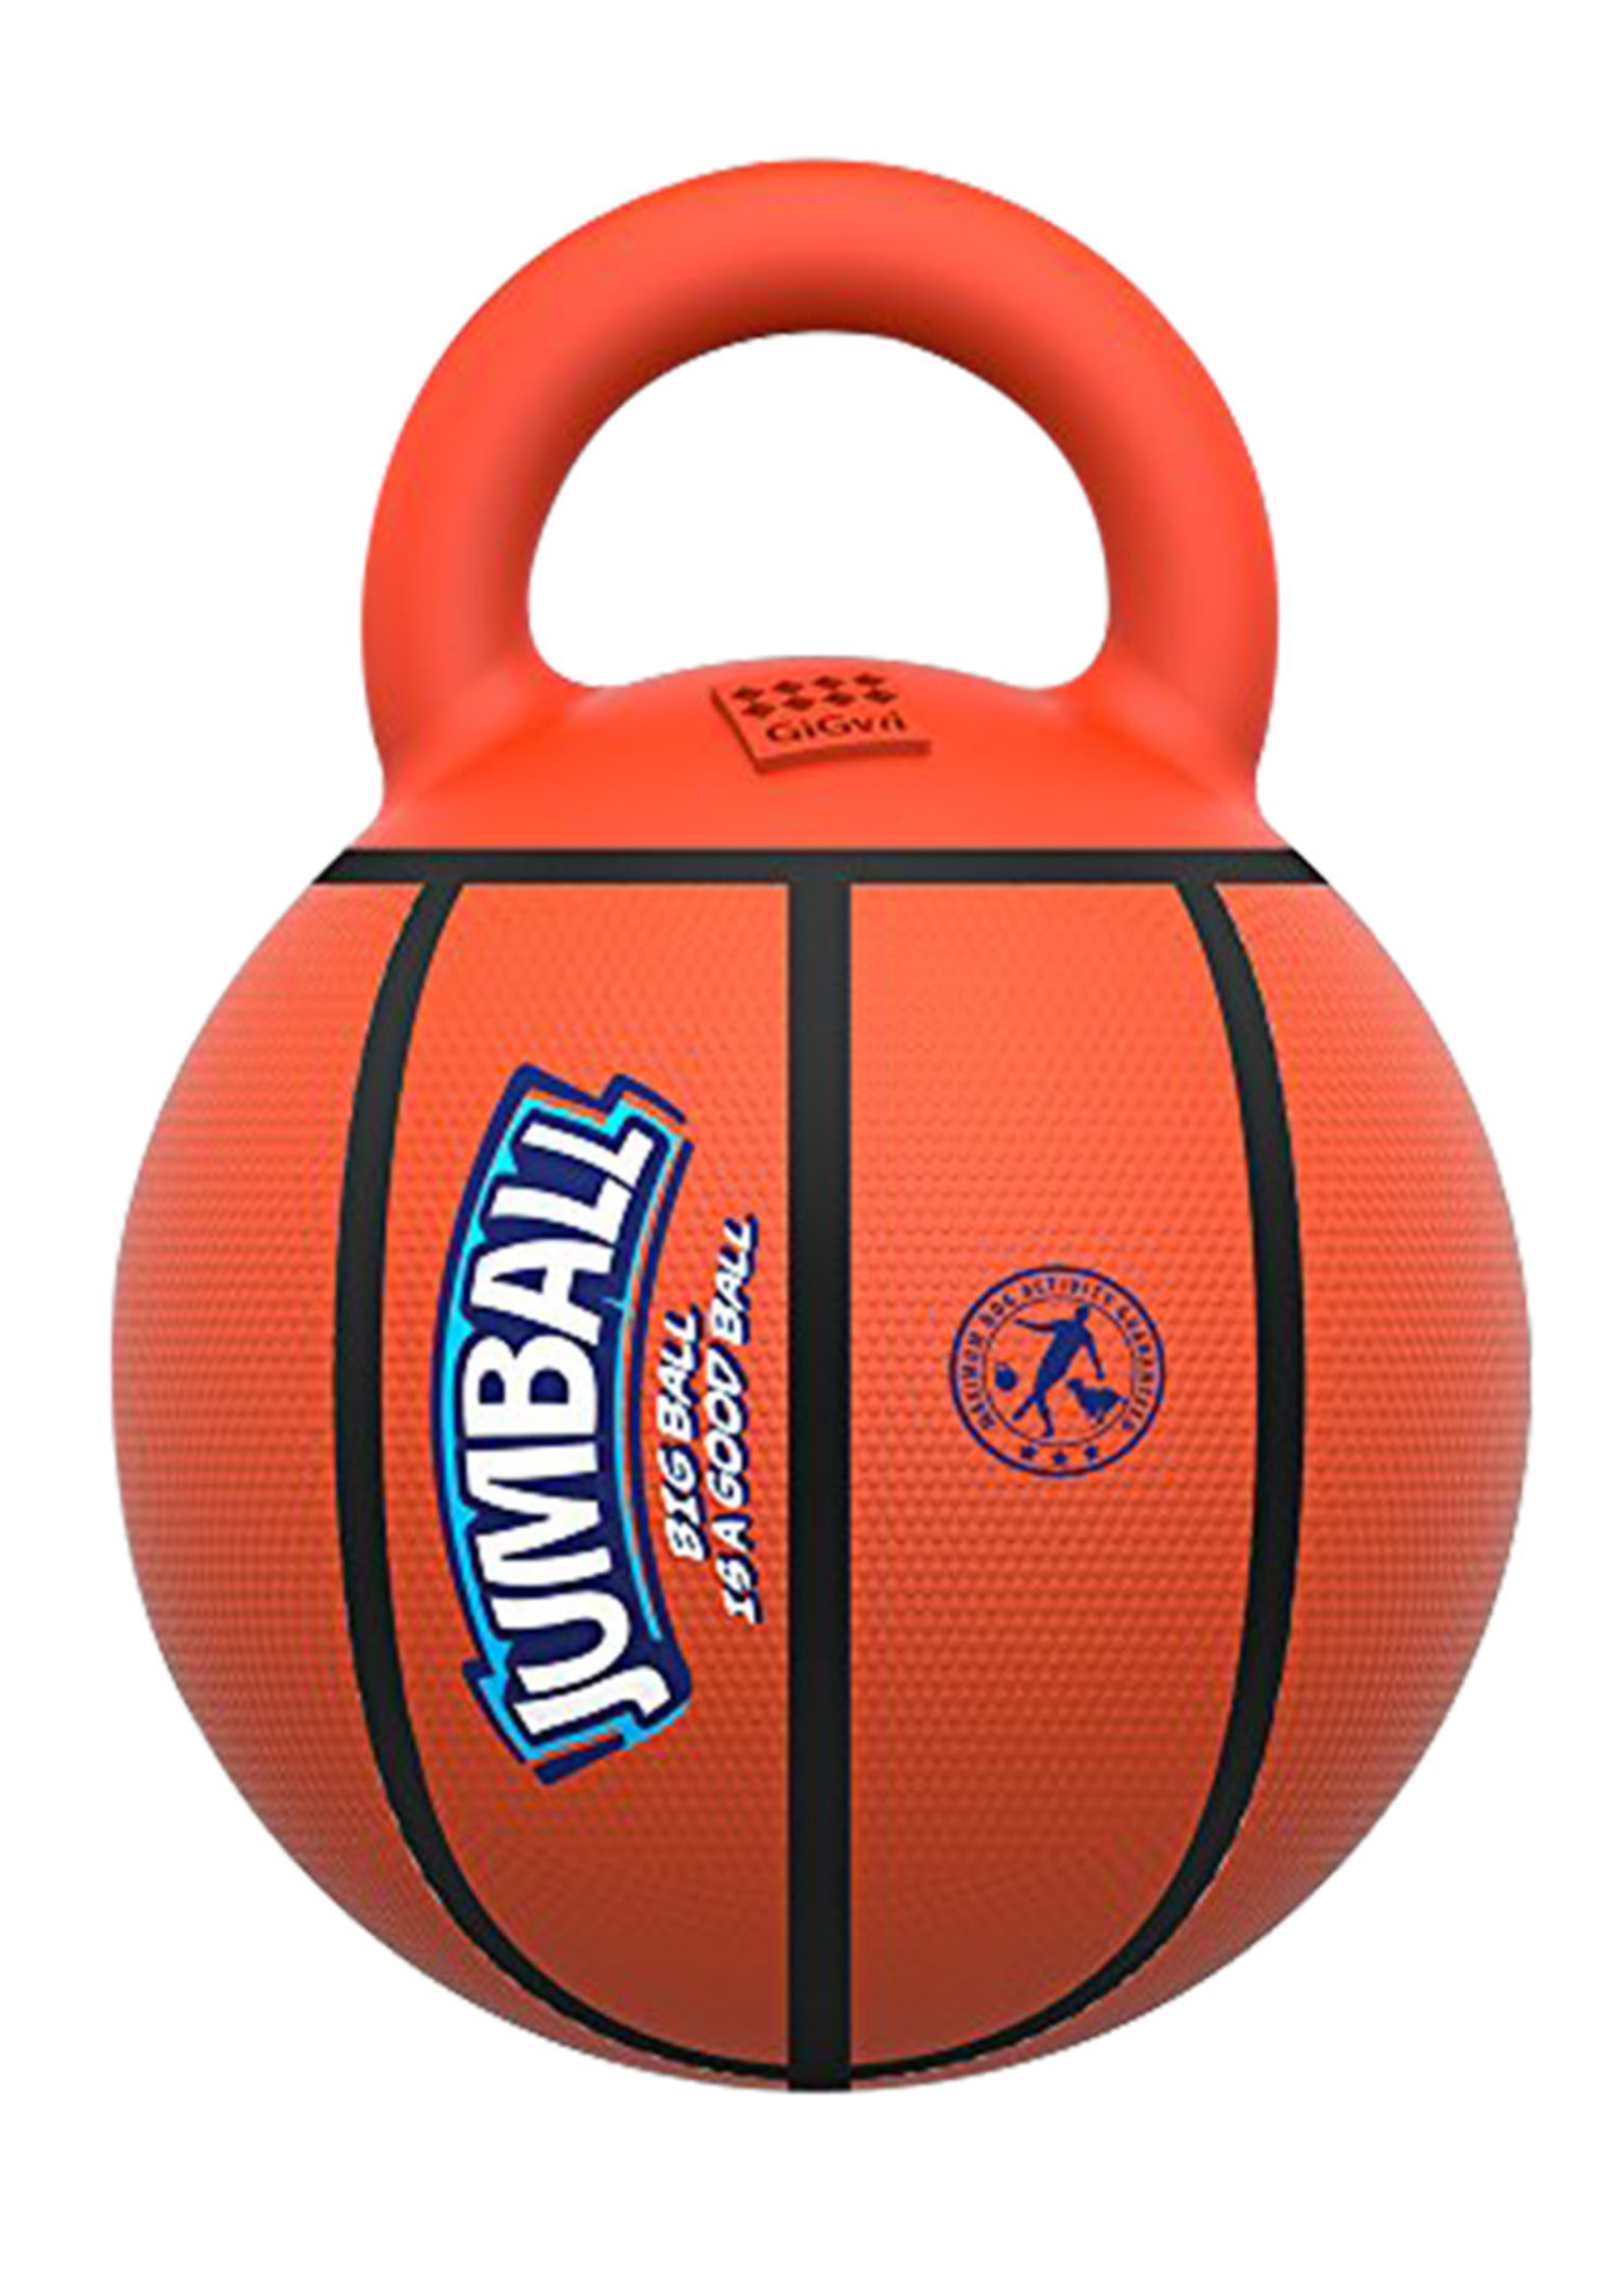 GiGwi GiGwi Jumball Basketball Large